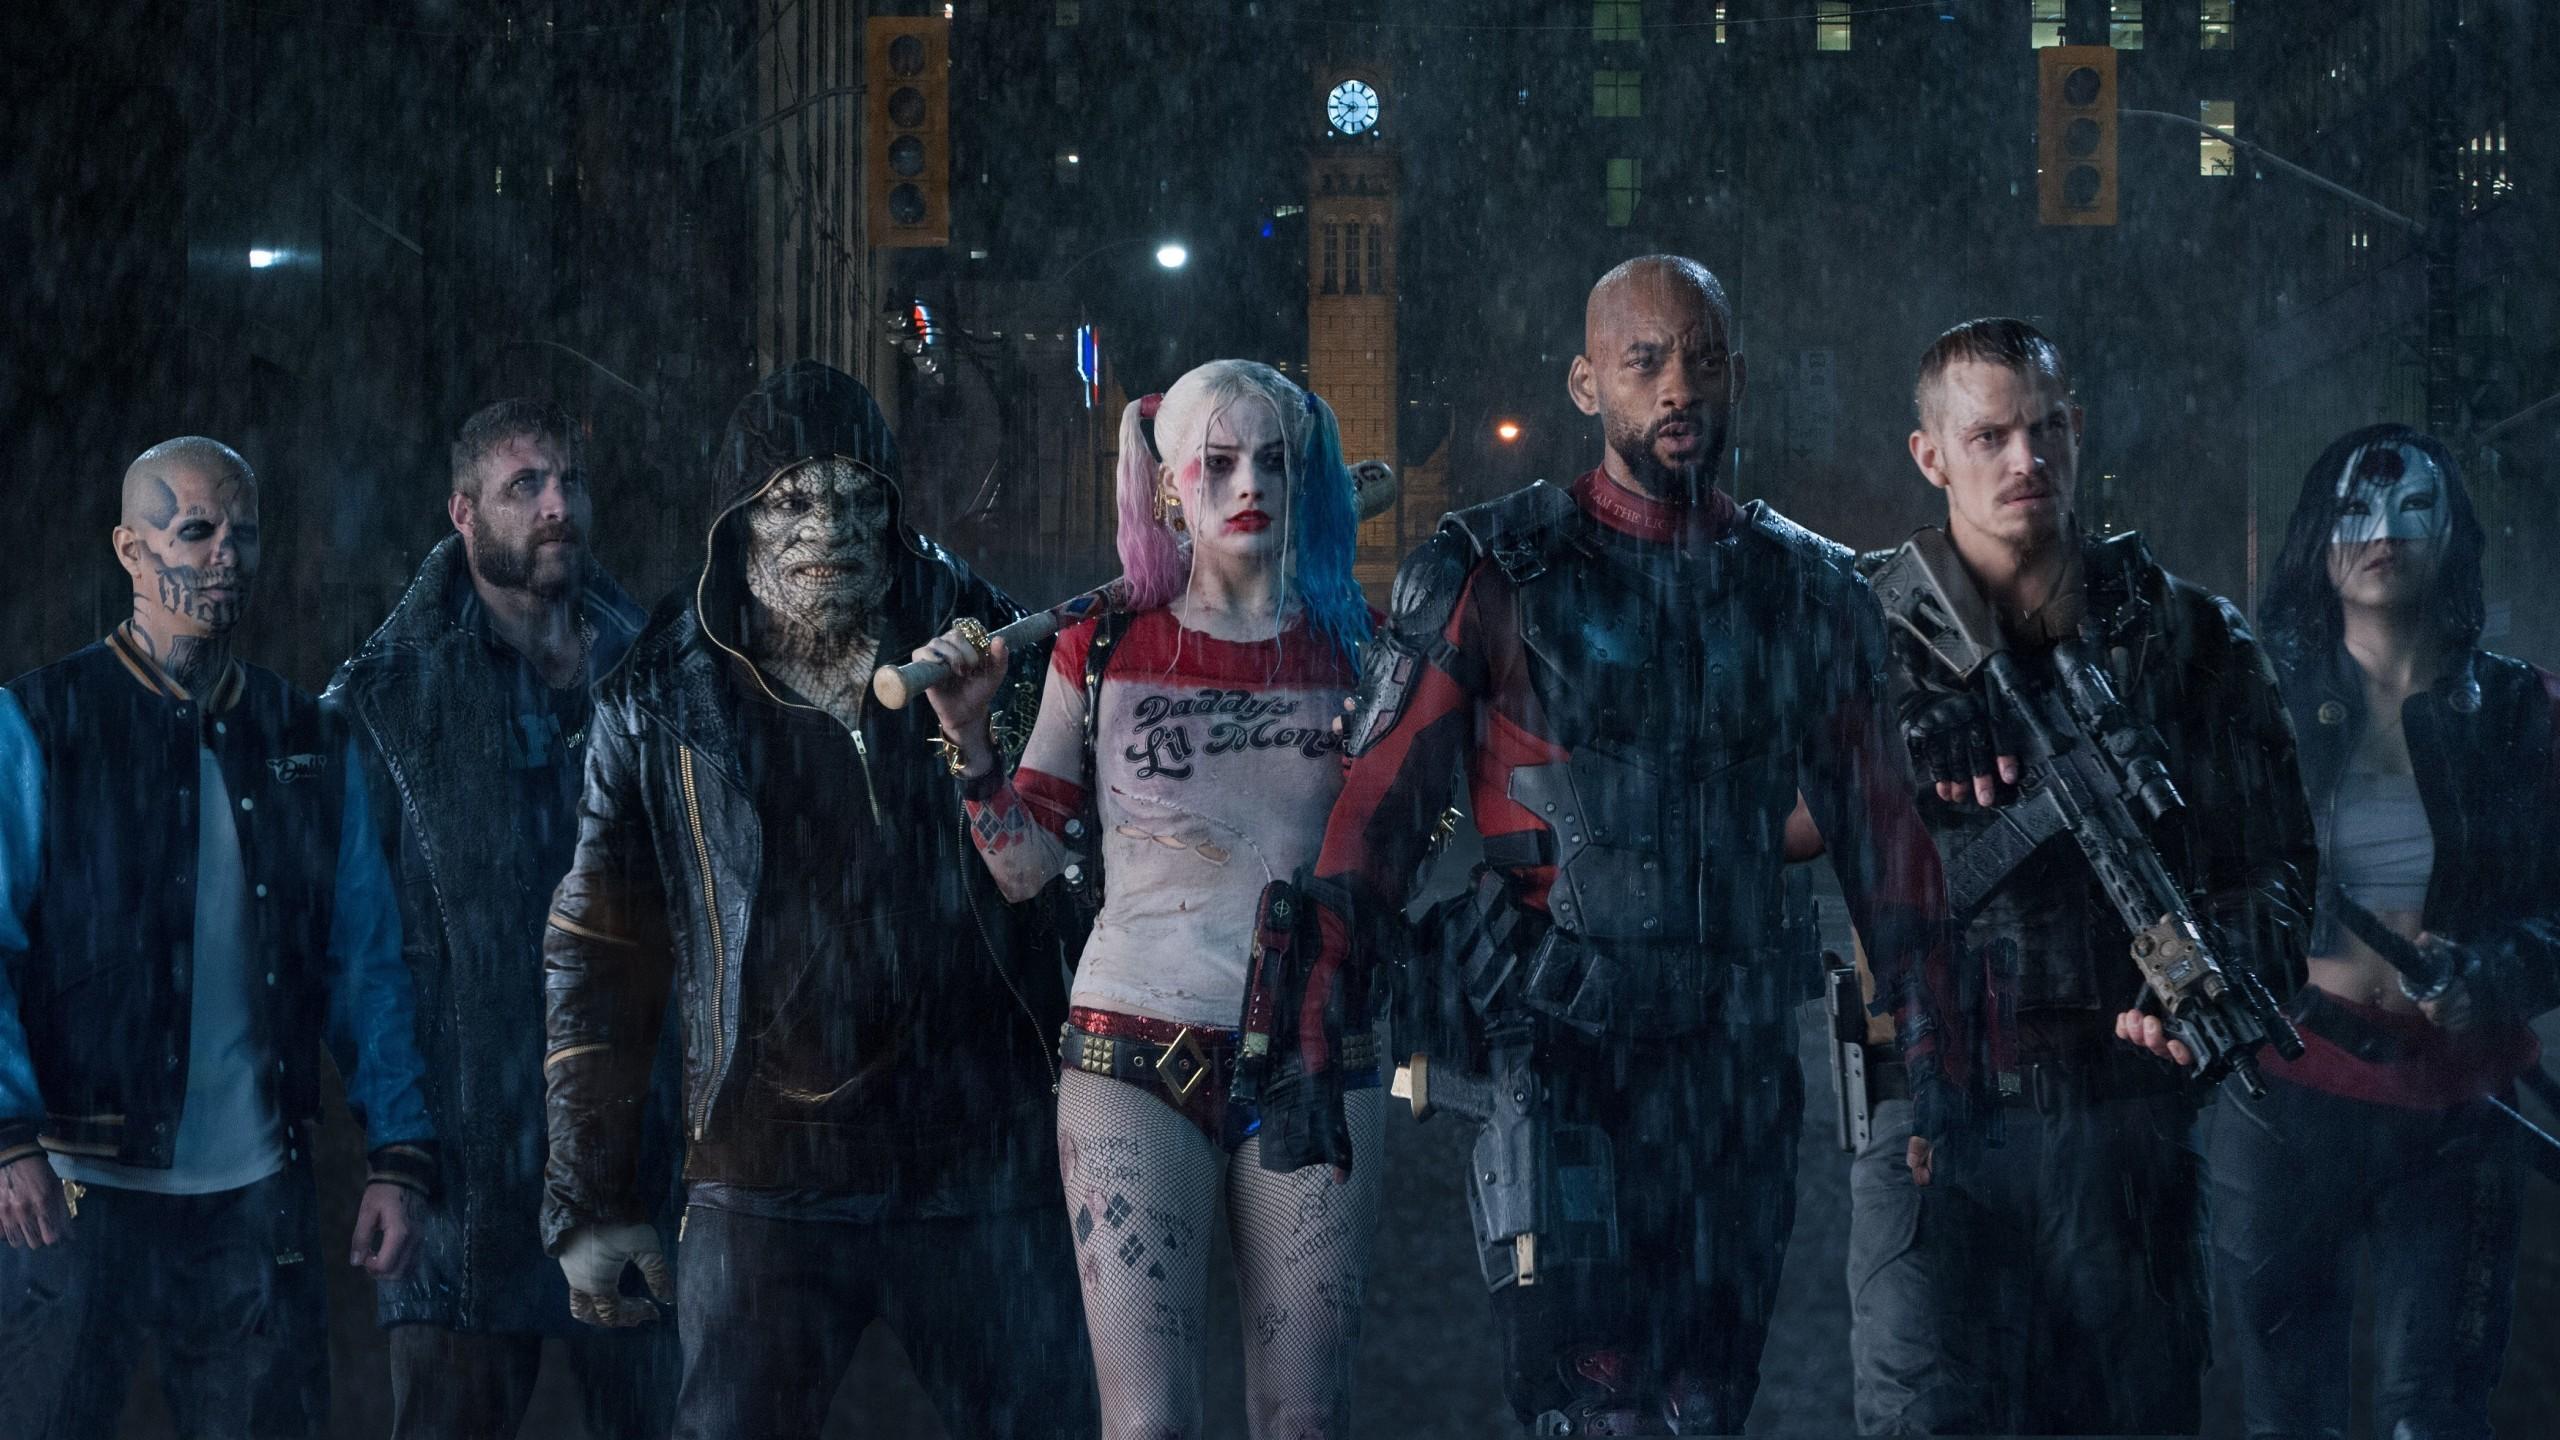 Movies / Suicide Squad Wallpaper